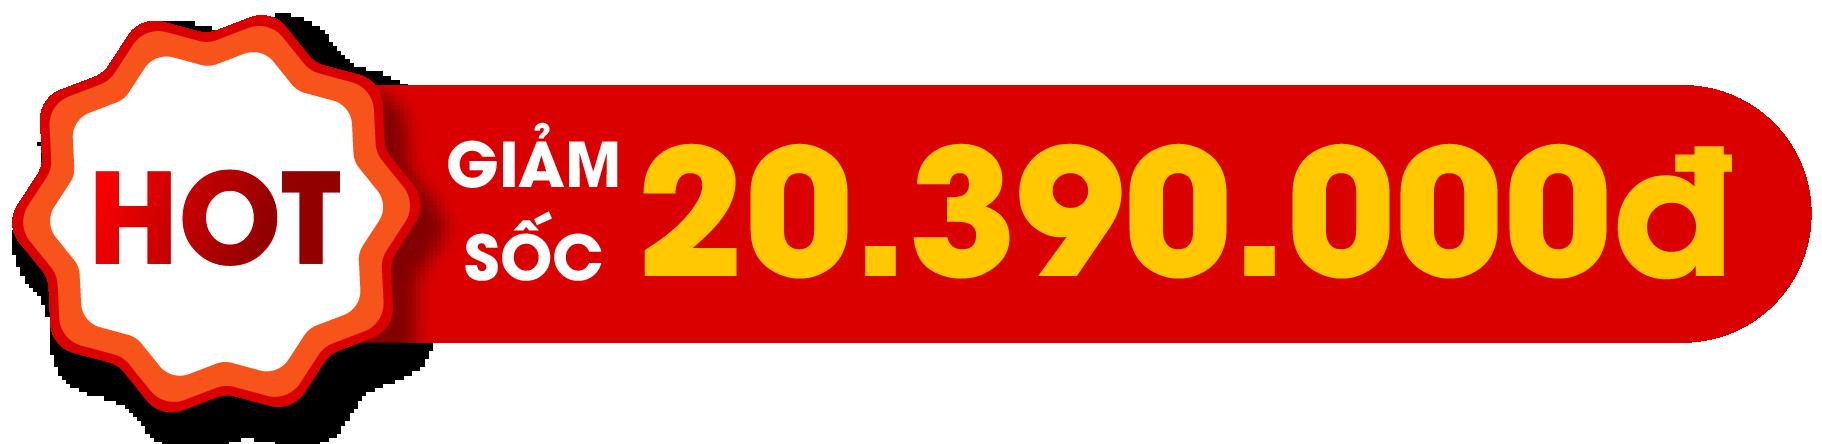 iPhone 12 128GB giá sốc